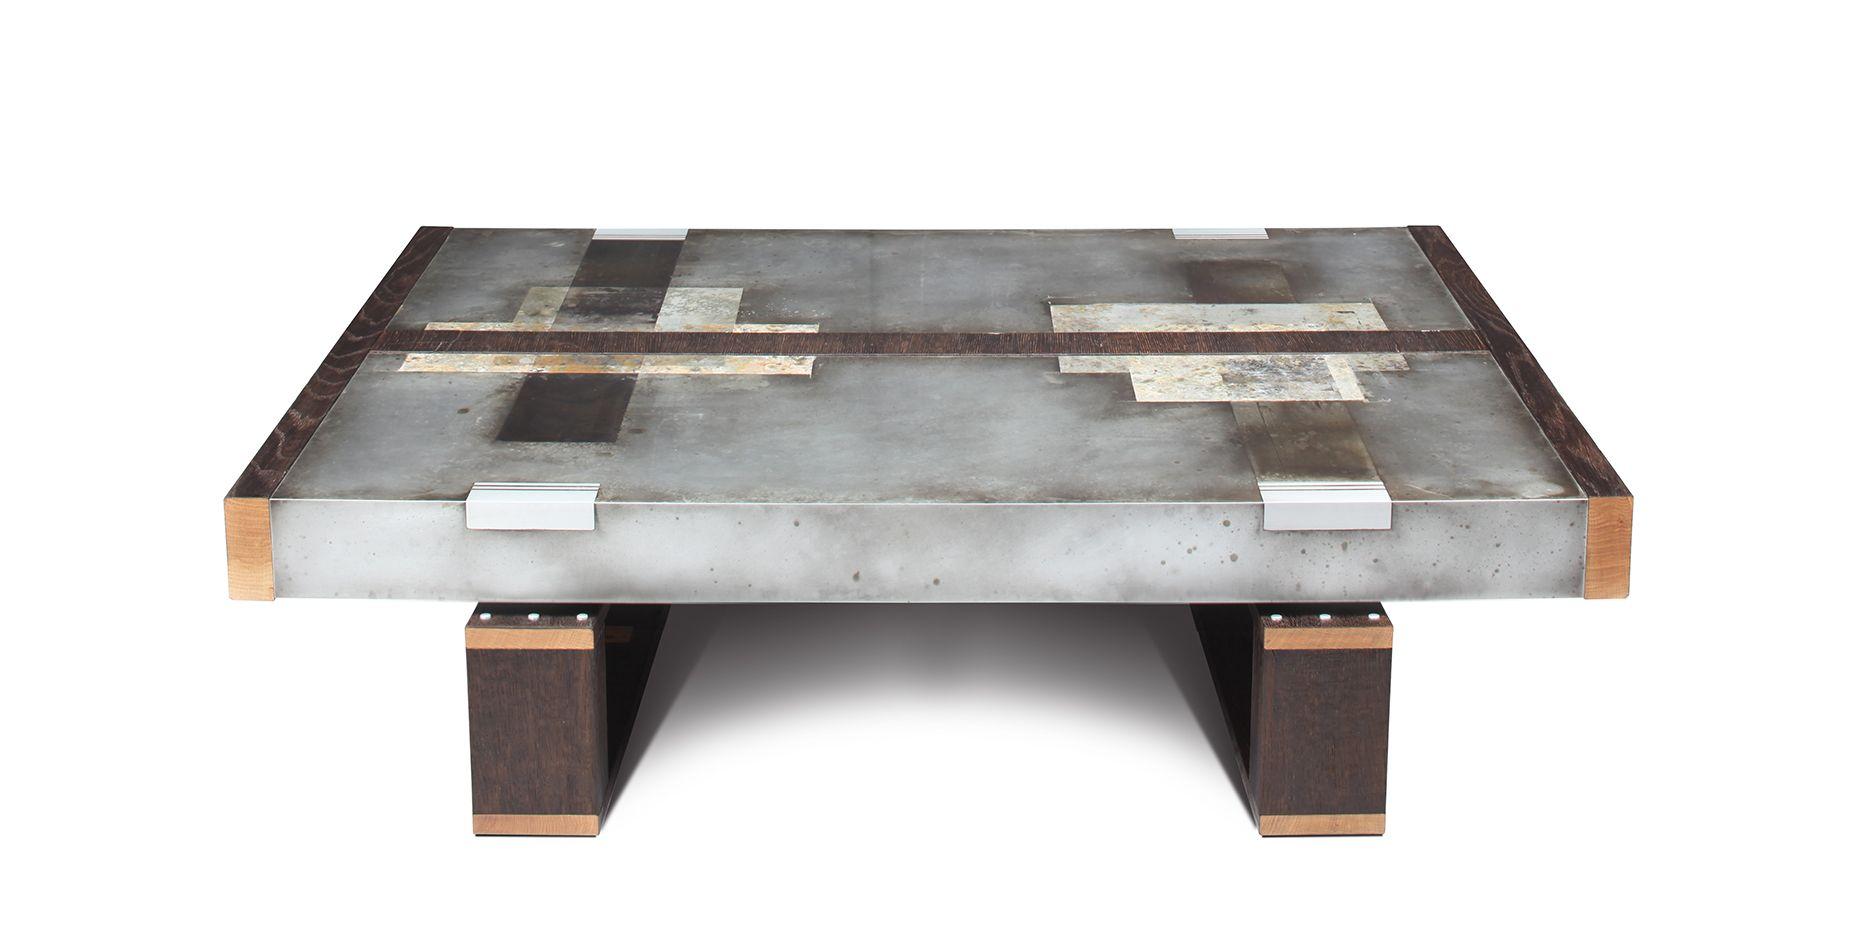 - StudioRoeper – DIVIDED LANDS ZINC Coffee Table In 2019 Zinc